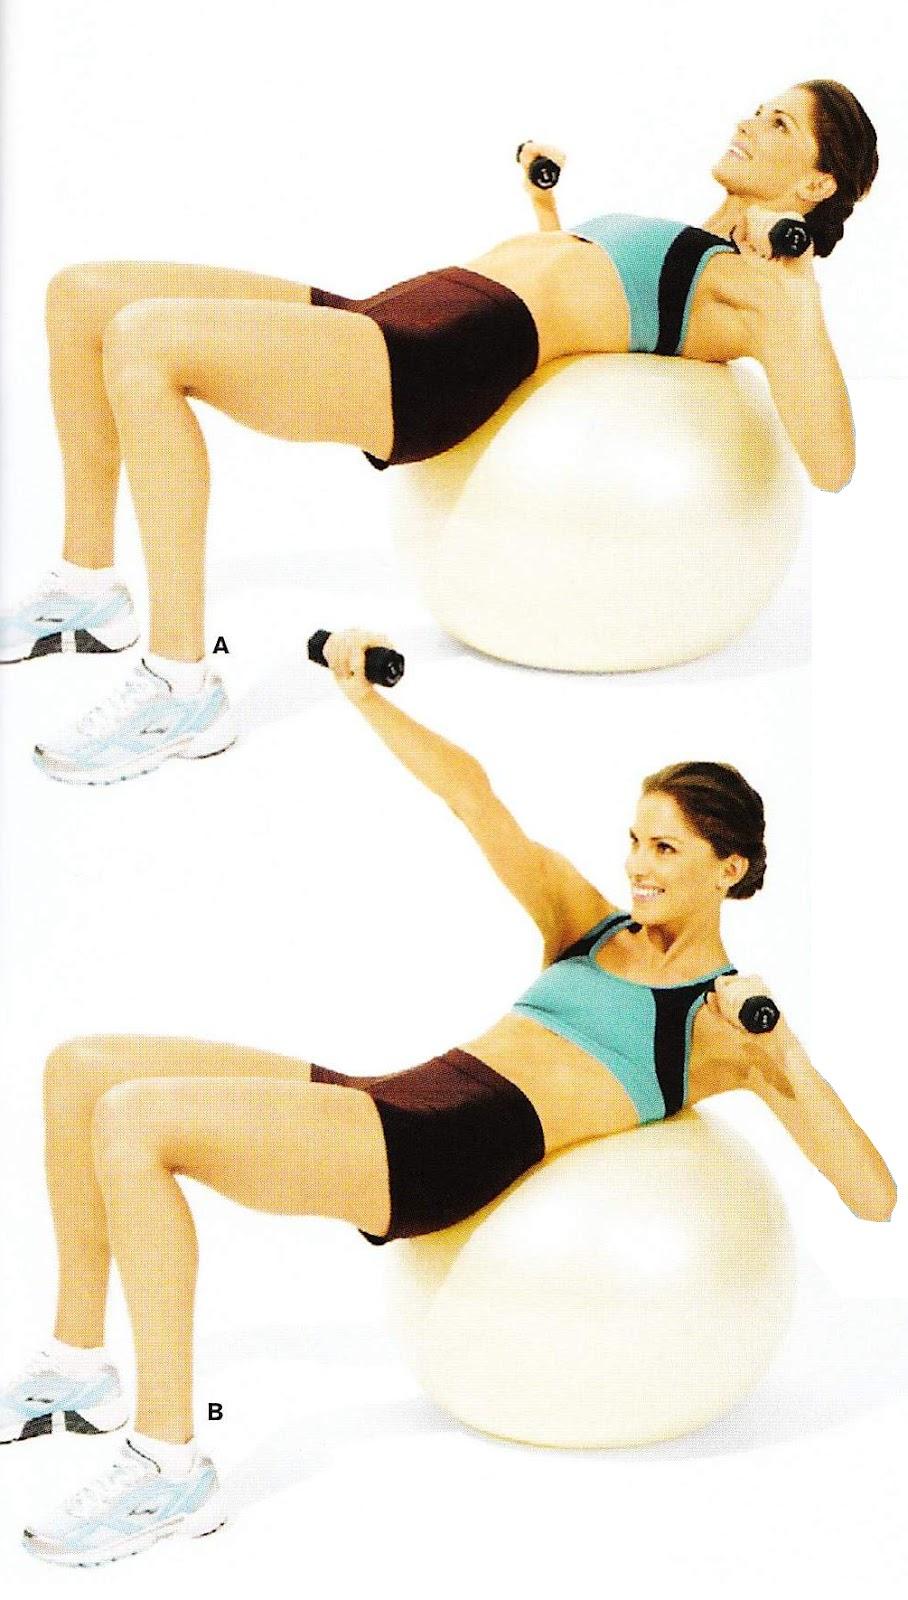 Best online weight loss program 2012 iso